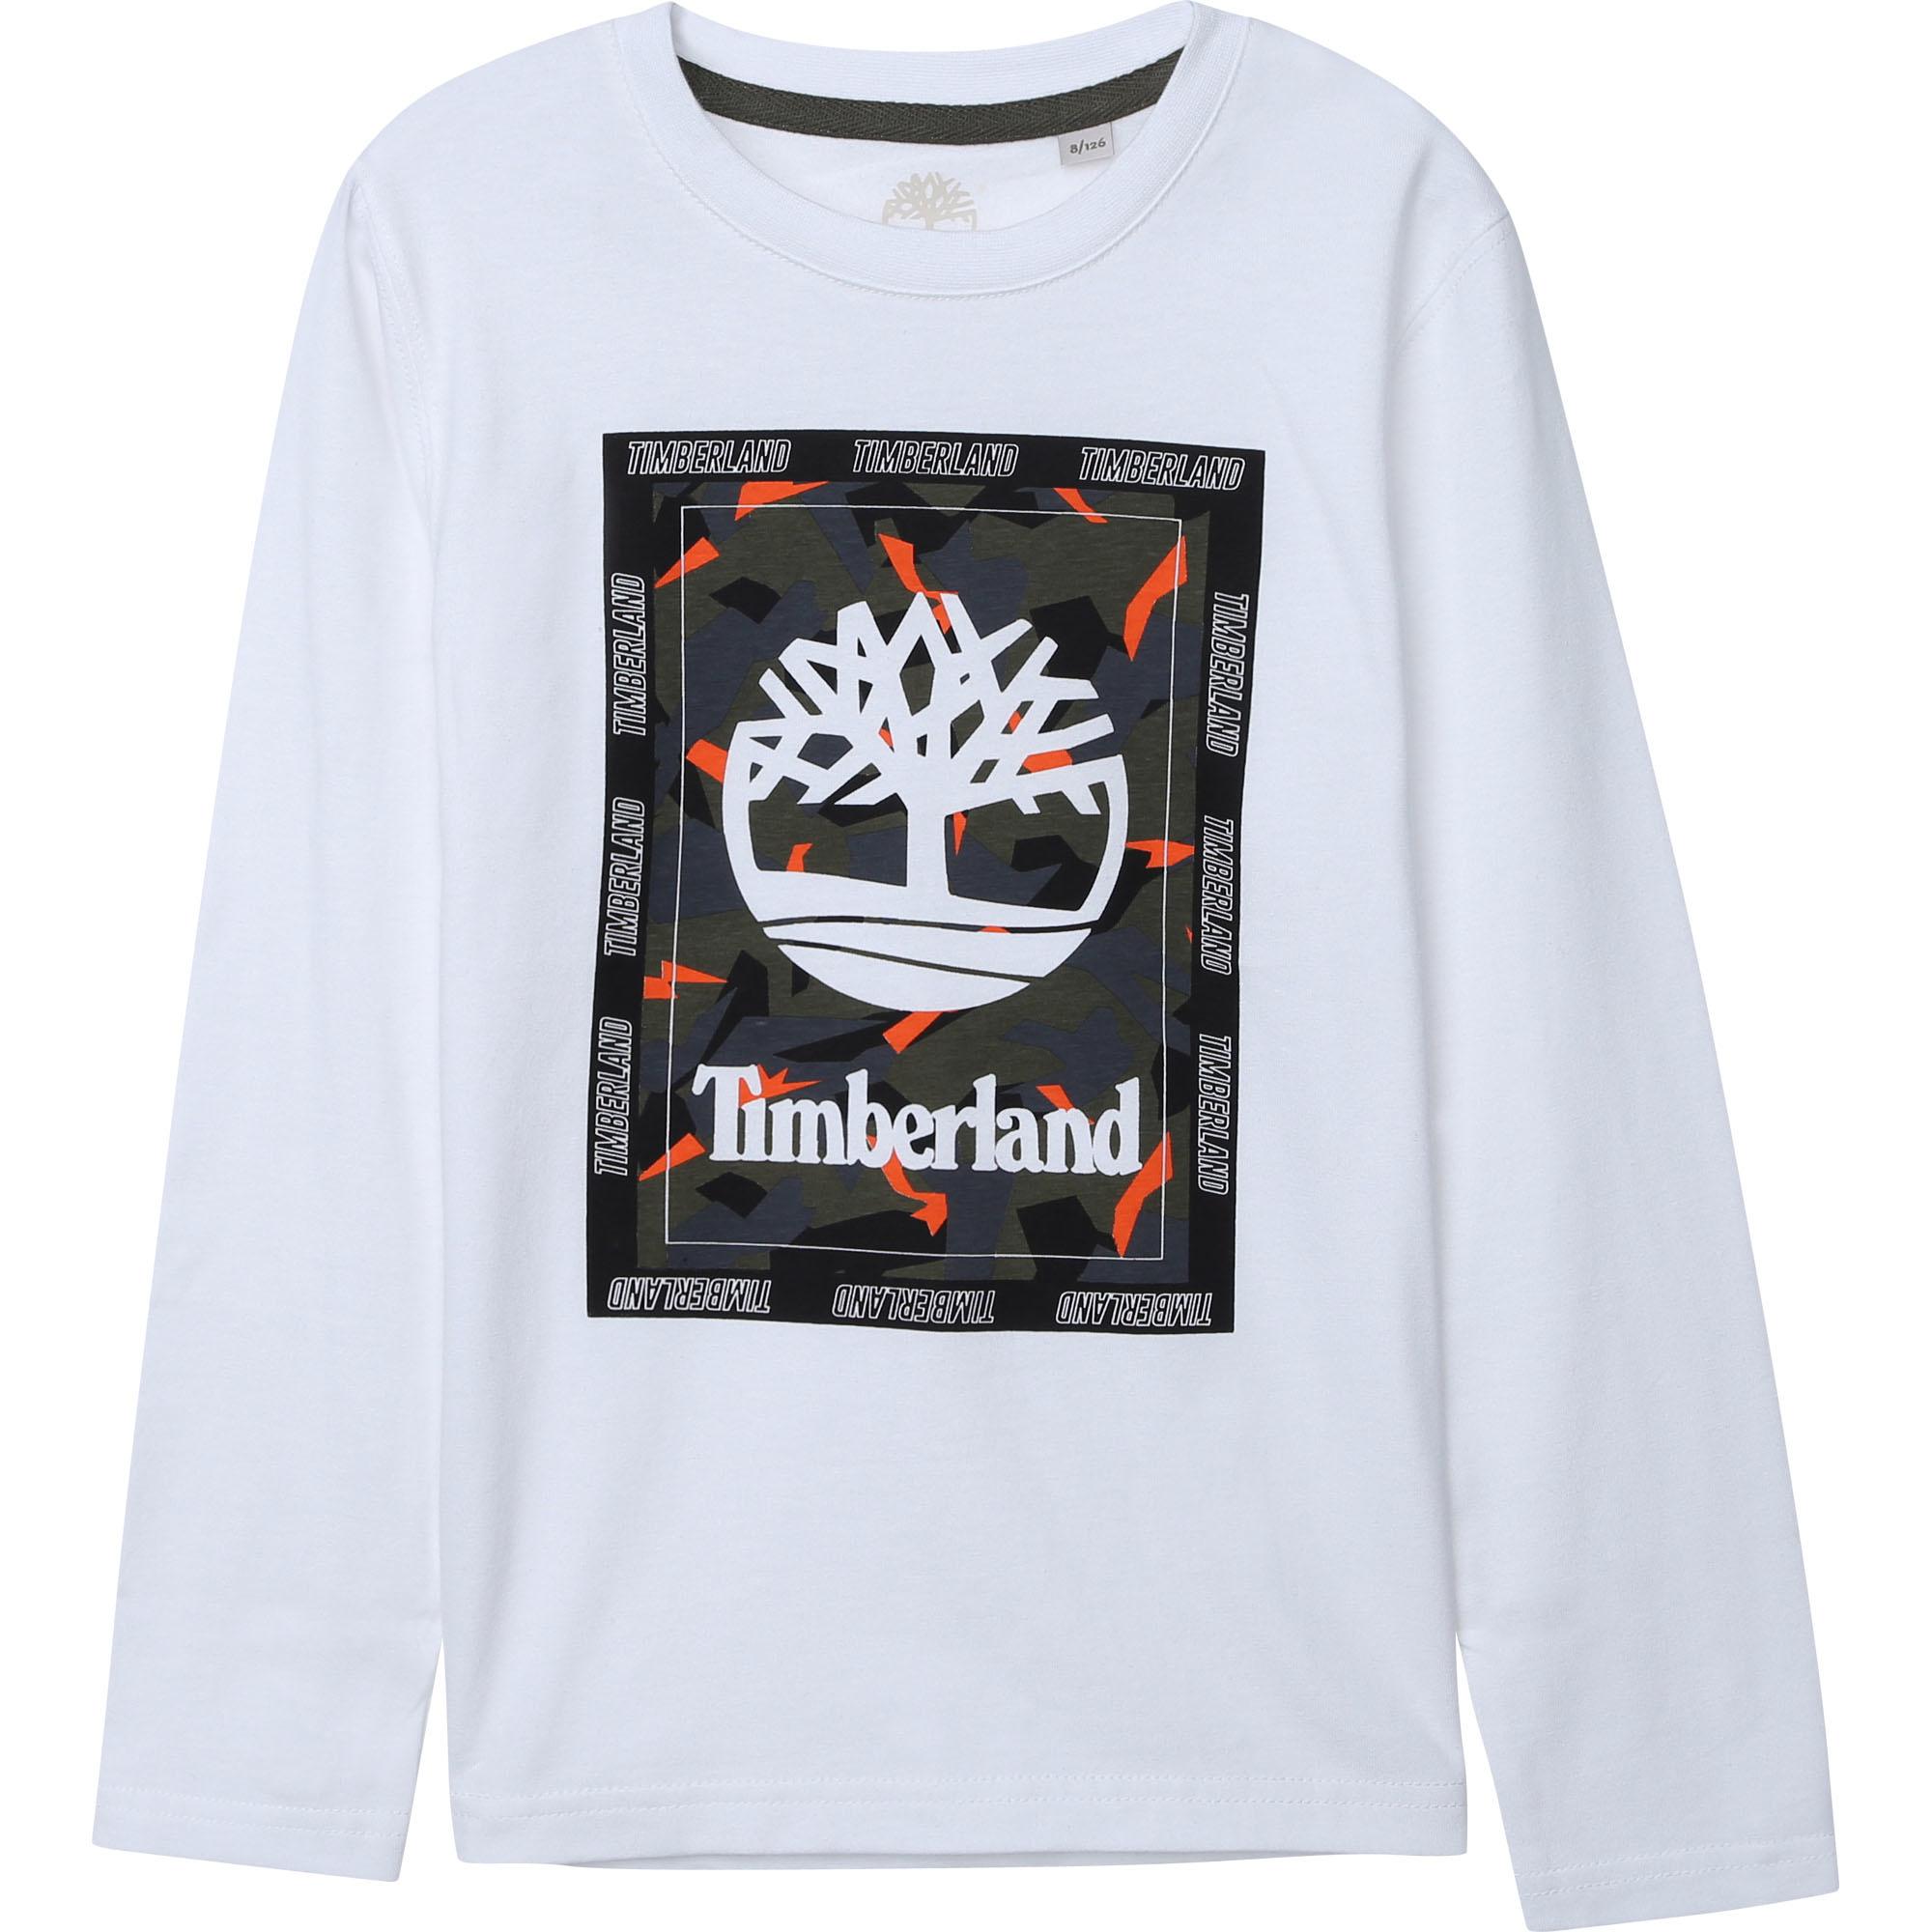 TIMBERLAND t-shirt en coton biologique-1